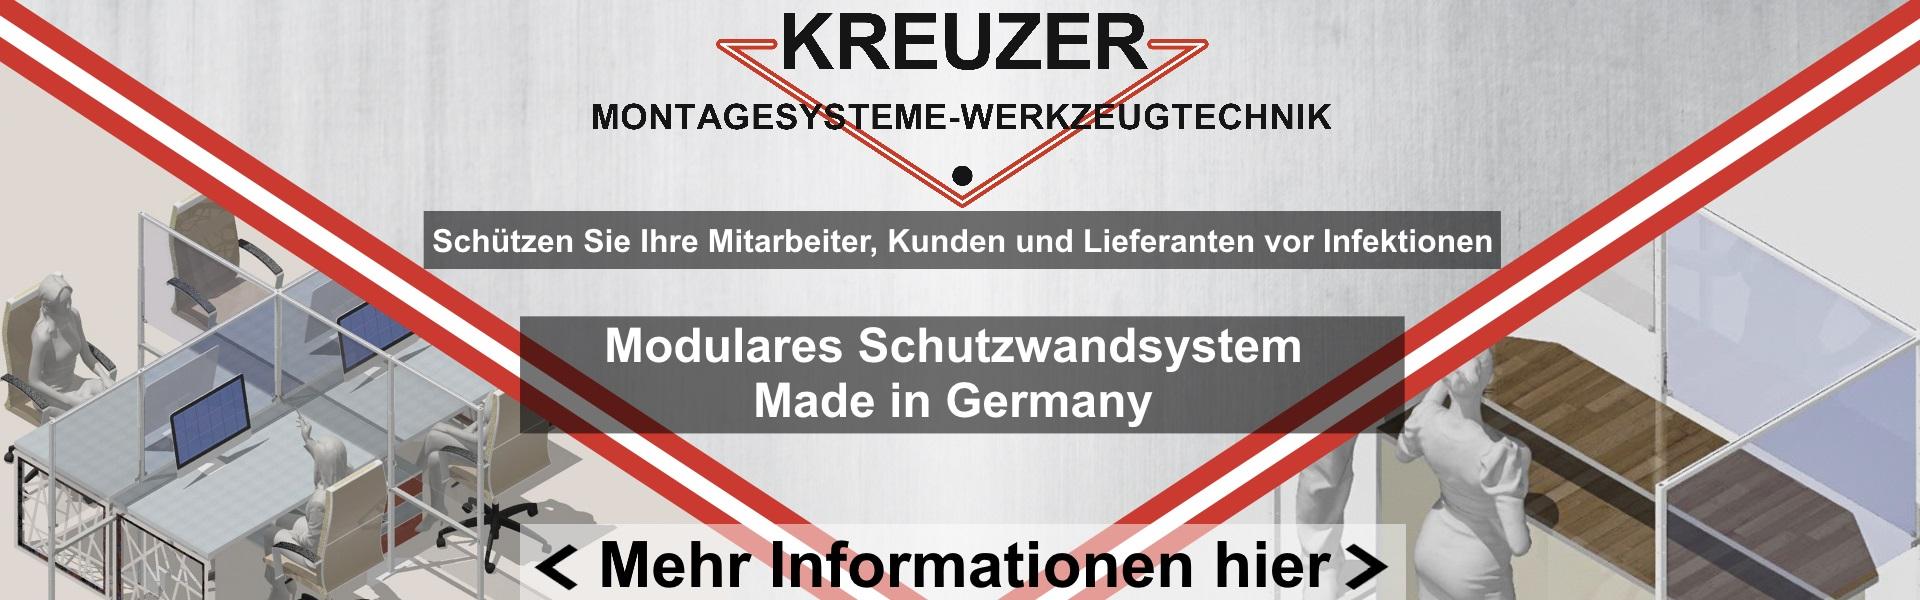 Modulares Schutzwandsystem – Made in Germany